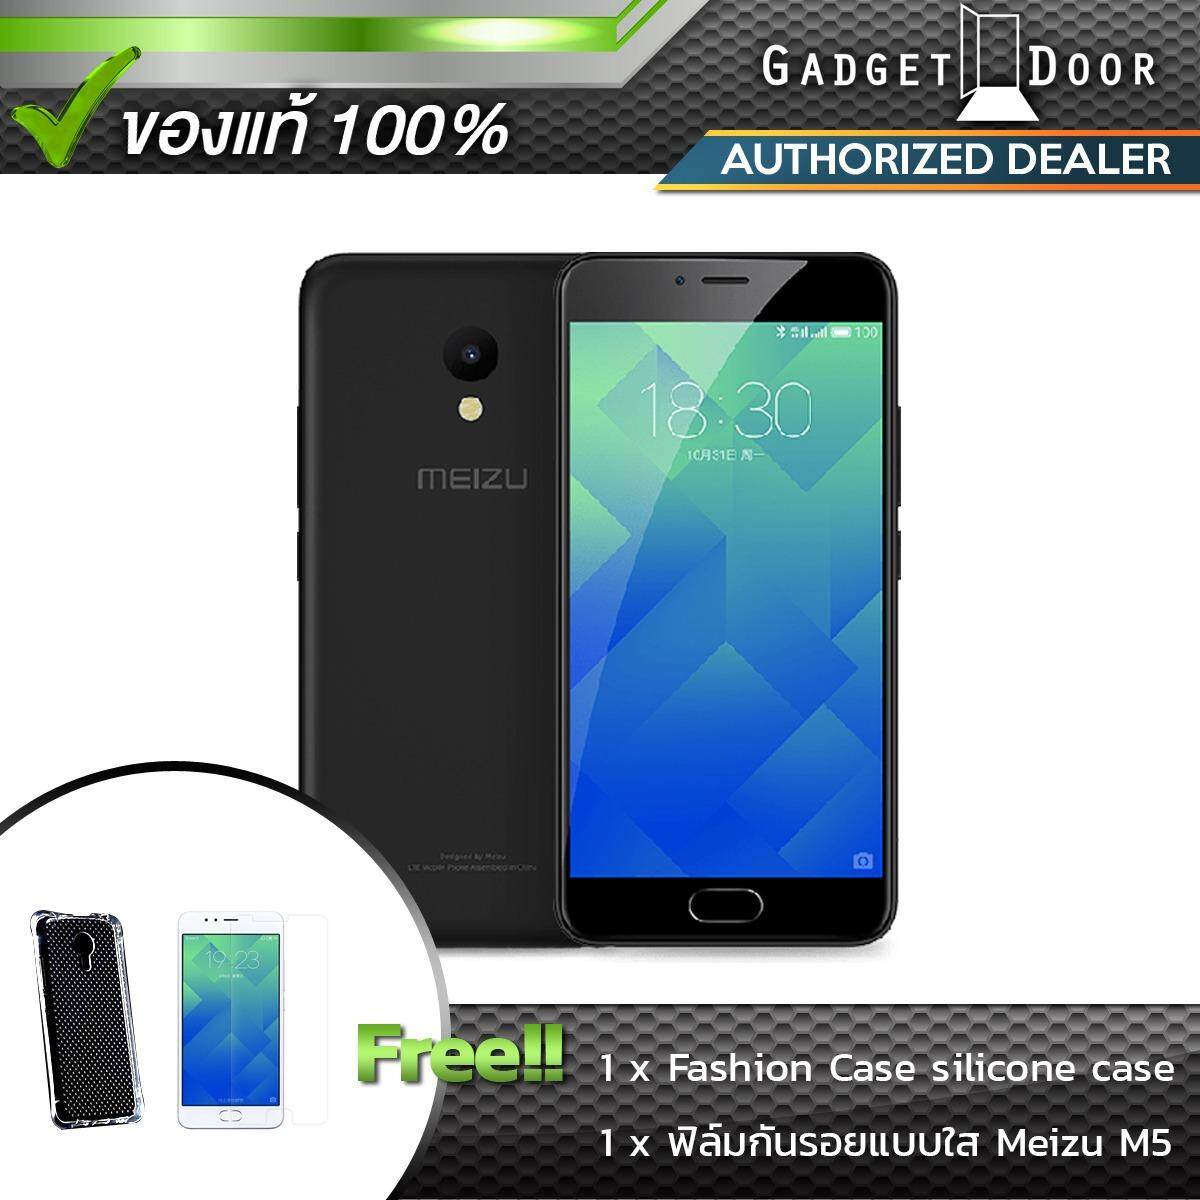 "Meizu M5 Smartphone 4G 5.2"" MT6750 Octa Core Android 6.0 2GB/16GB (Black) แถมฟรี Fashion case , ฟิล์มกันรอย (มูลค่ารวม 990 บาท)"